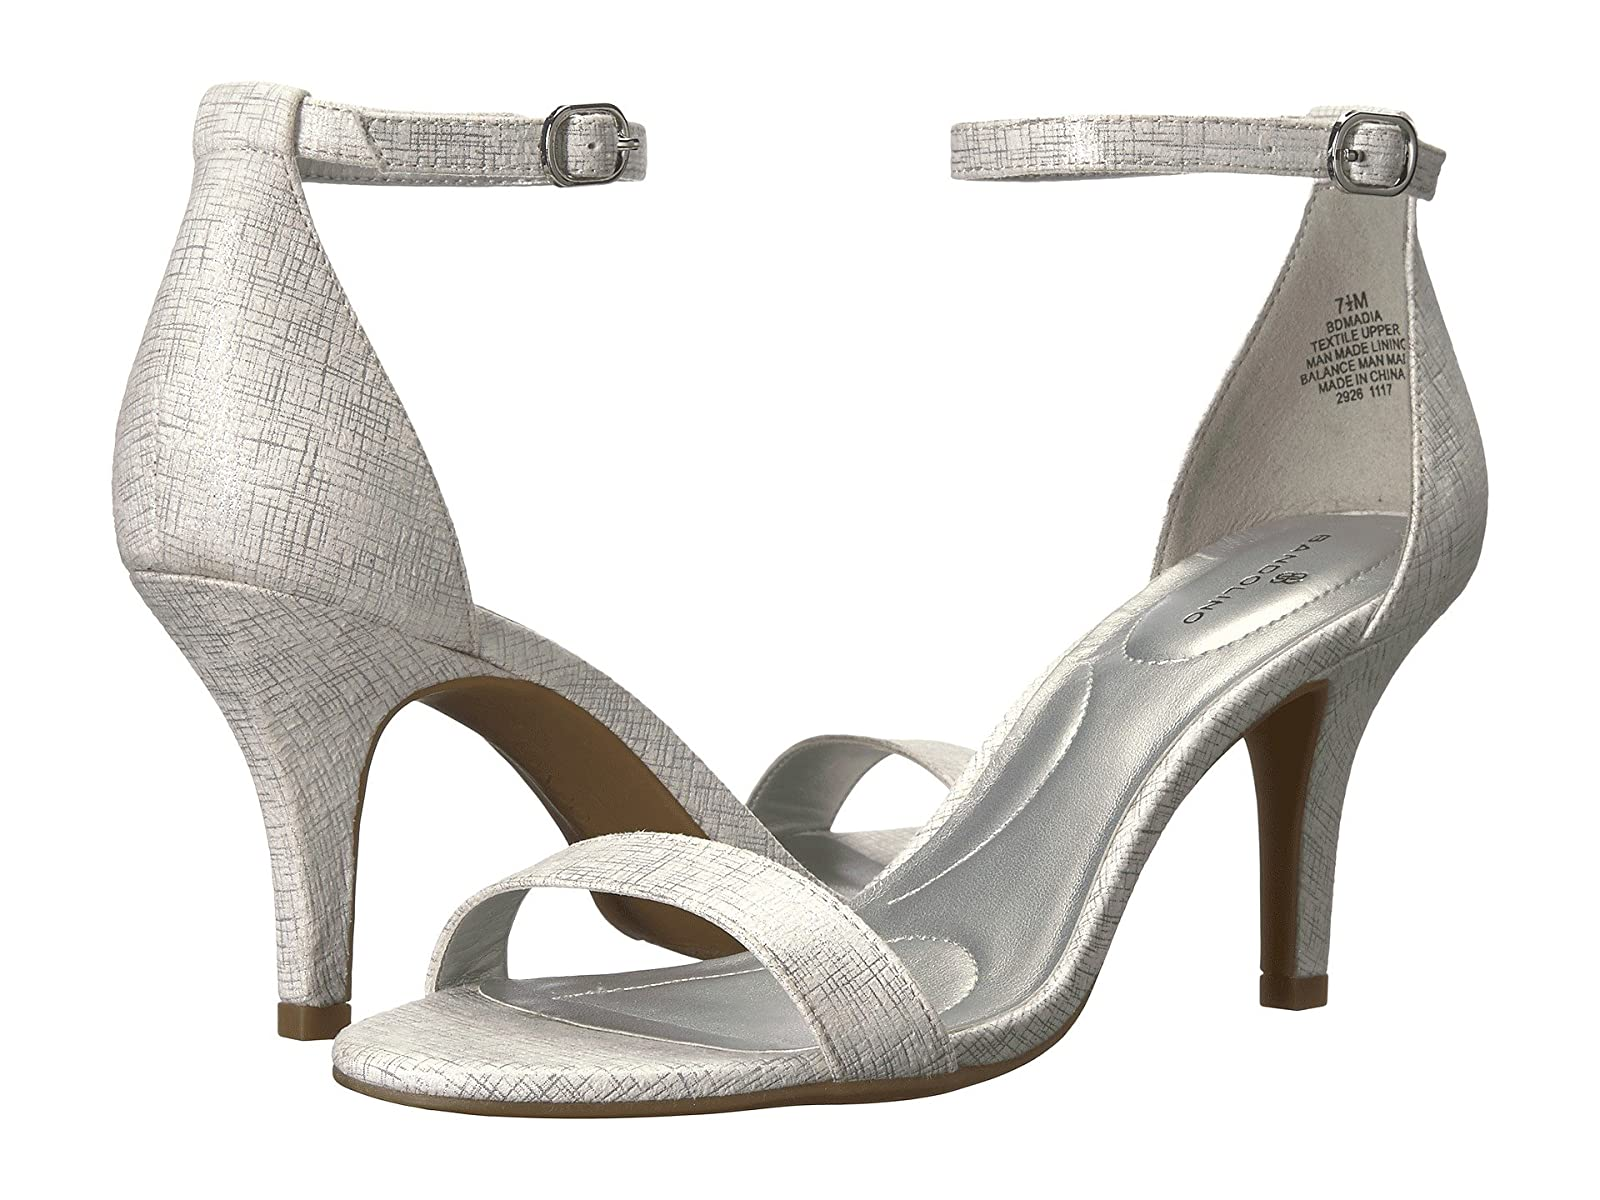 Bandolino MadiaCheap and distinctive eye-catching shoes